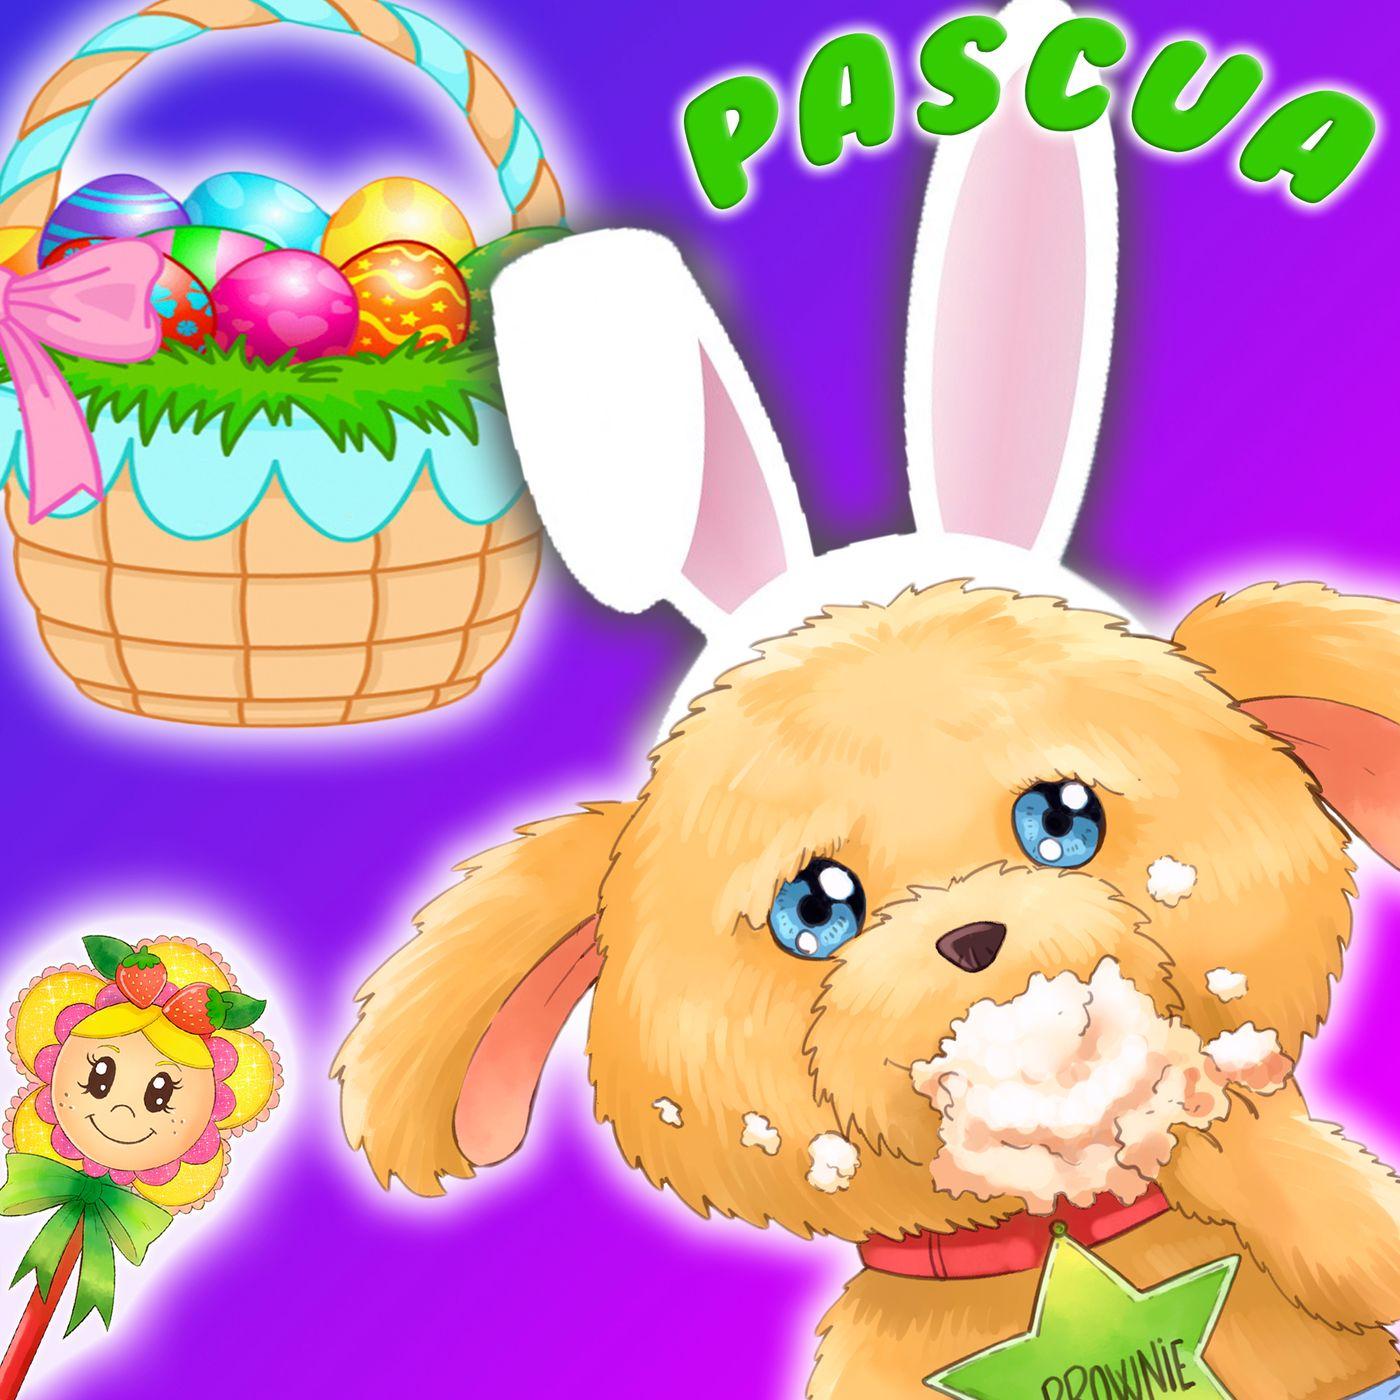 32. Brownie es la liebrecita de Pascua. Cuento infantil para aprender inglés con el Hada de Fresa sobre la Pascua